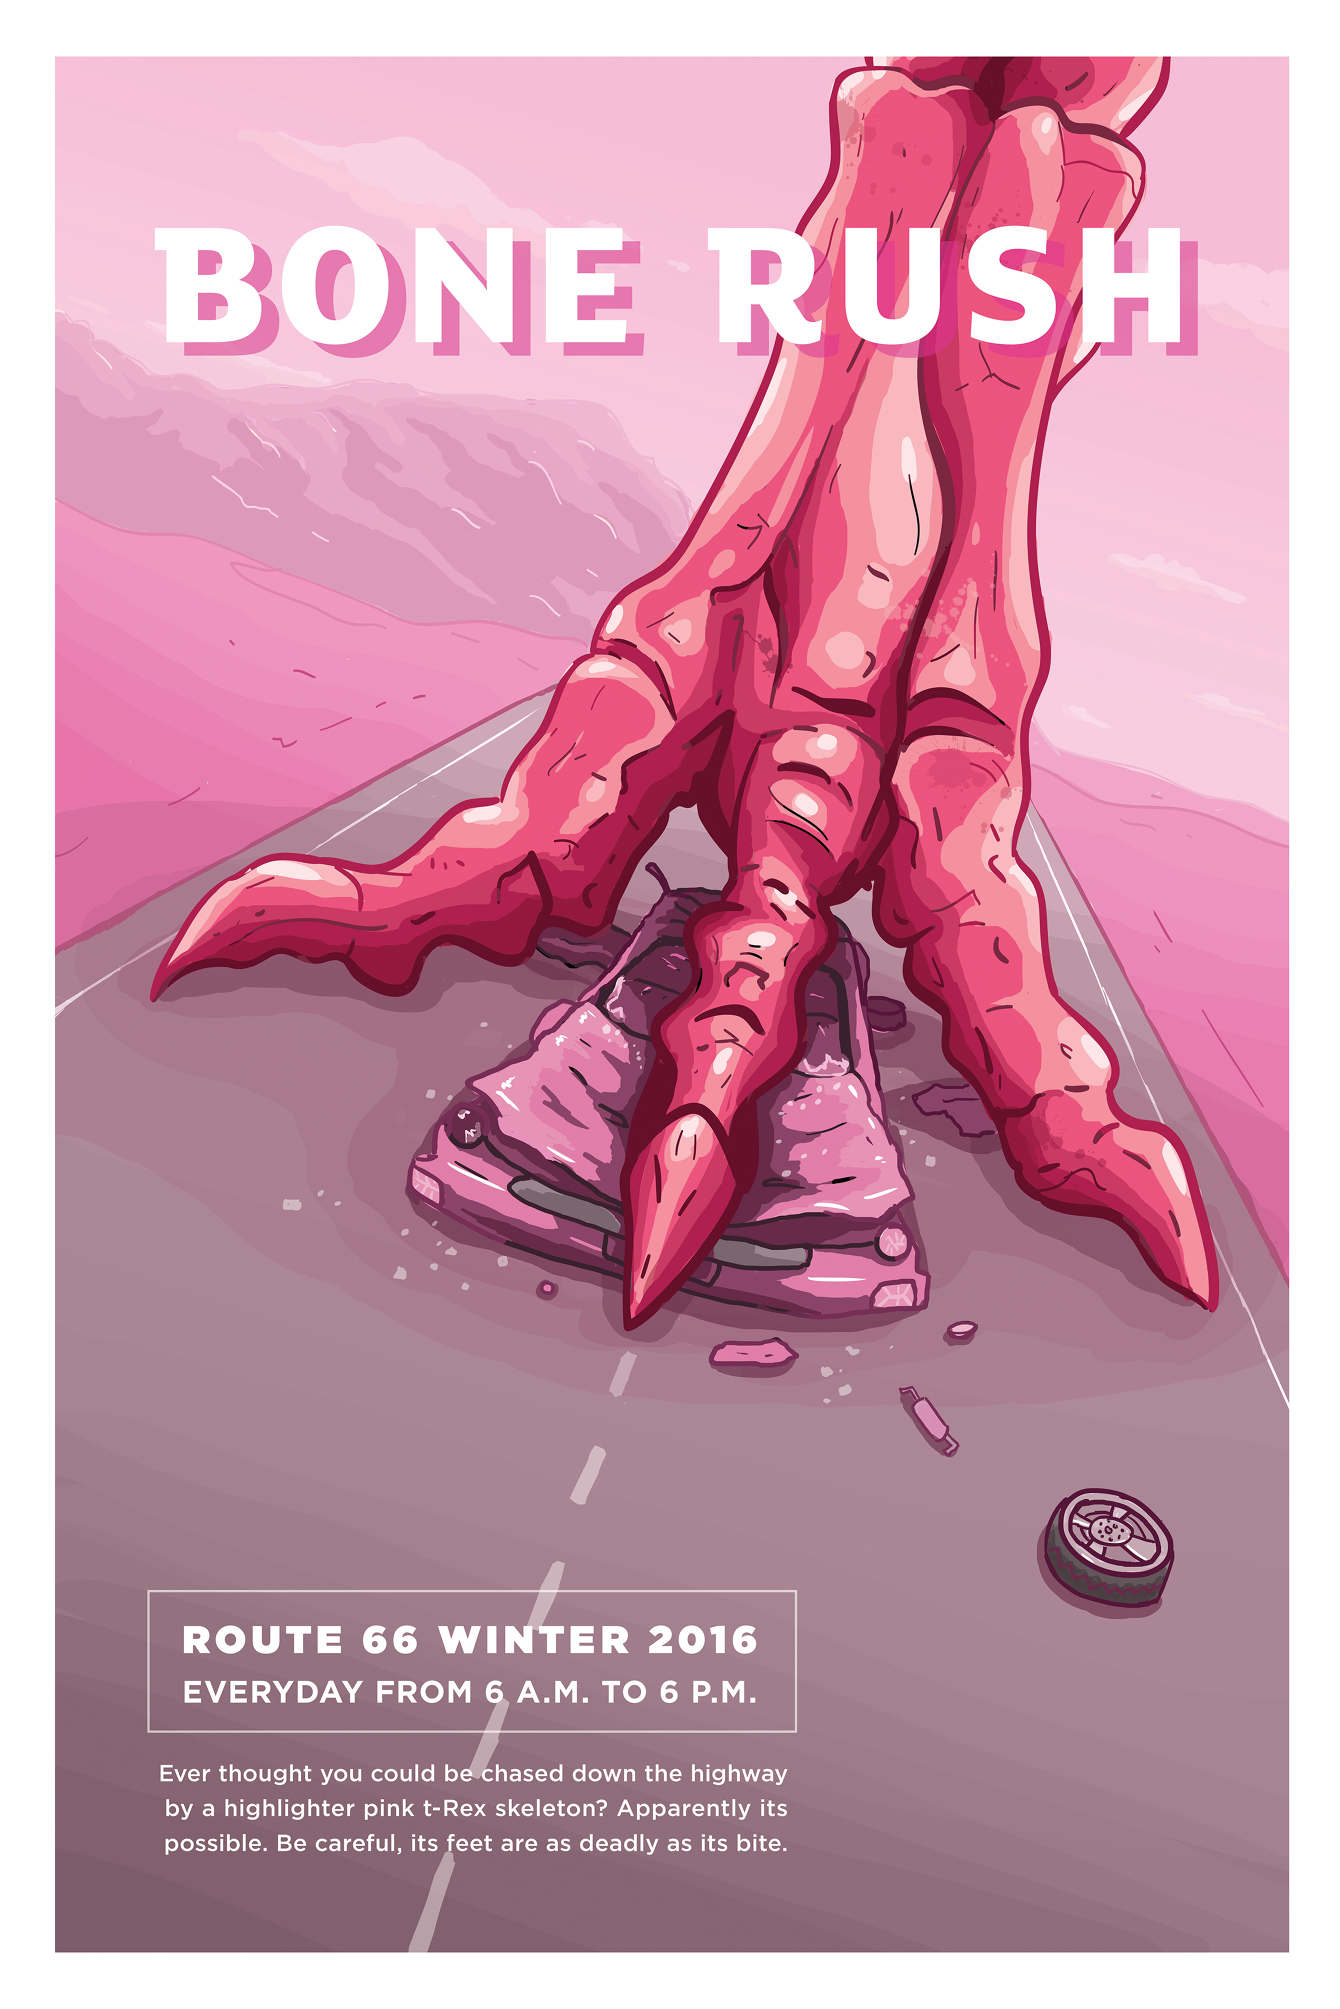 fictional event posters em design and illustration